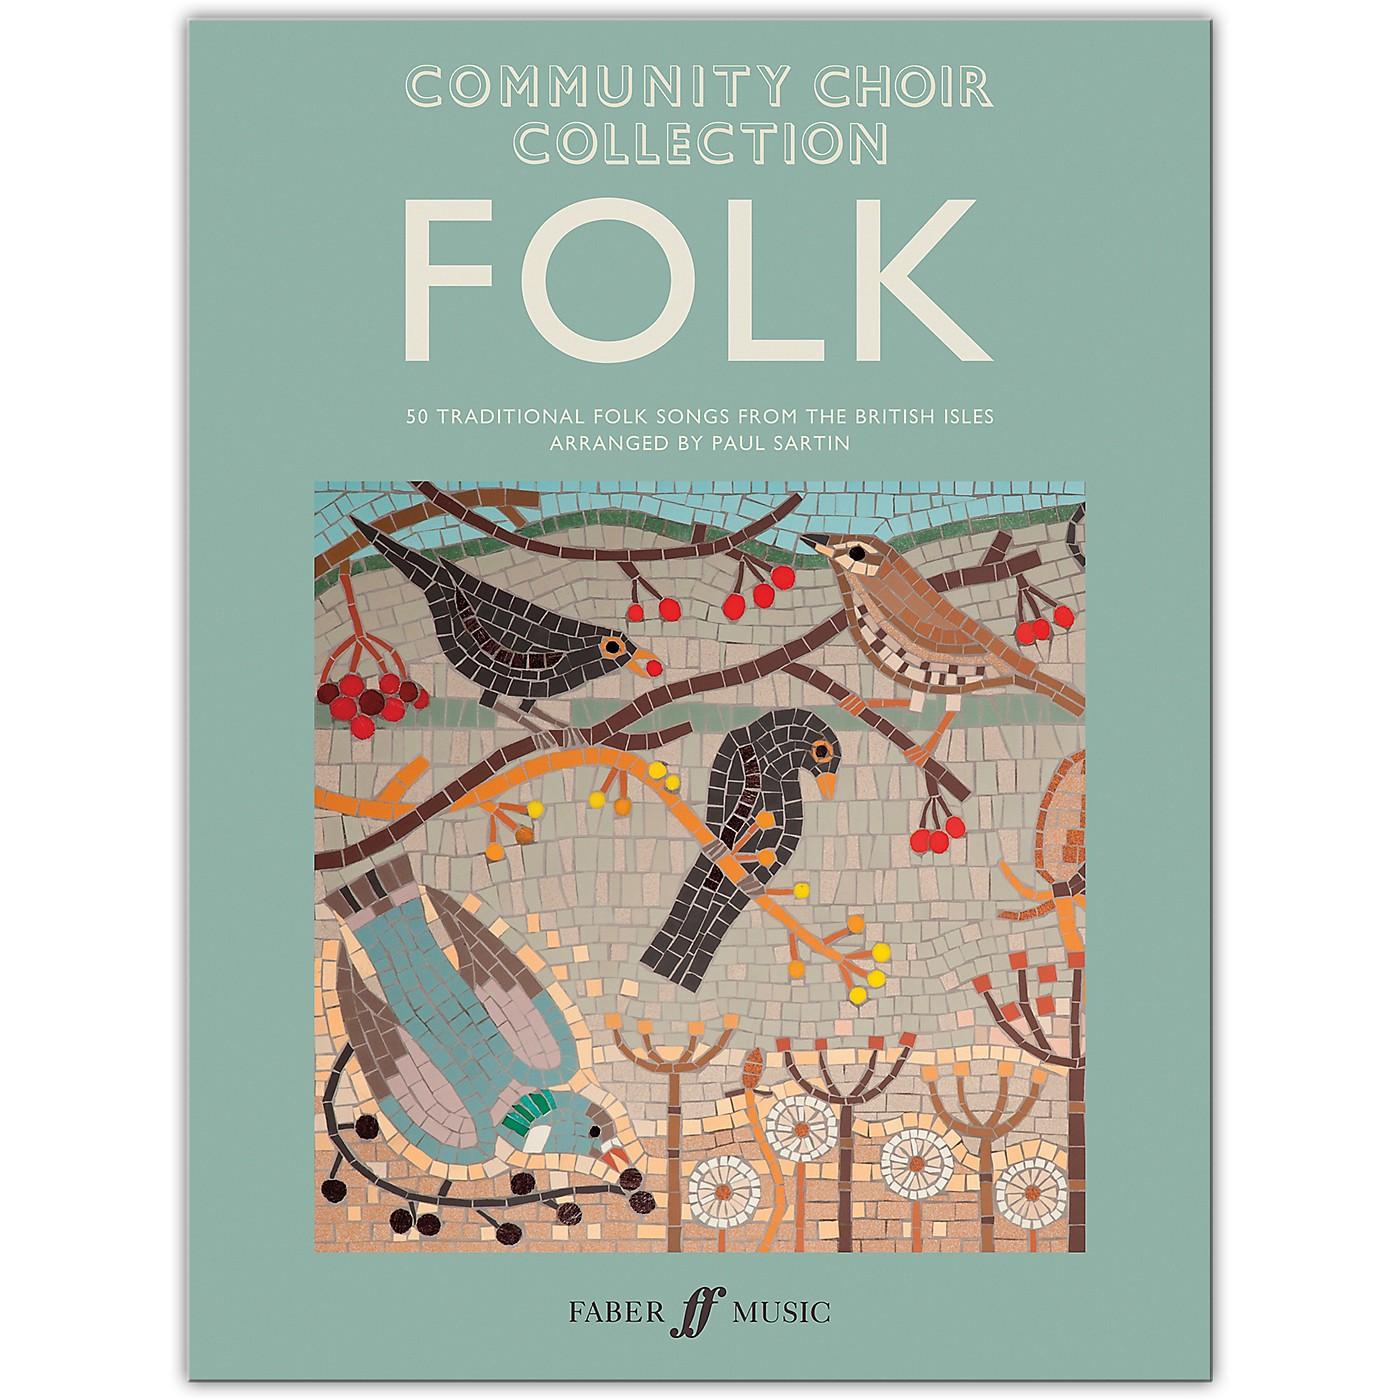 Faber Music LTD Community Choir Collection: Folk Mixed Voices thumbnail